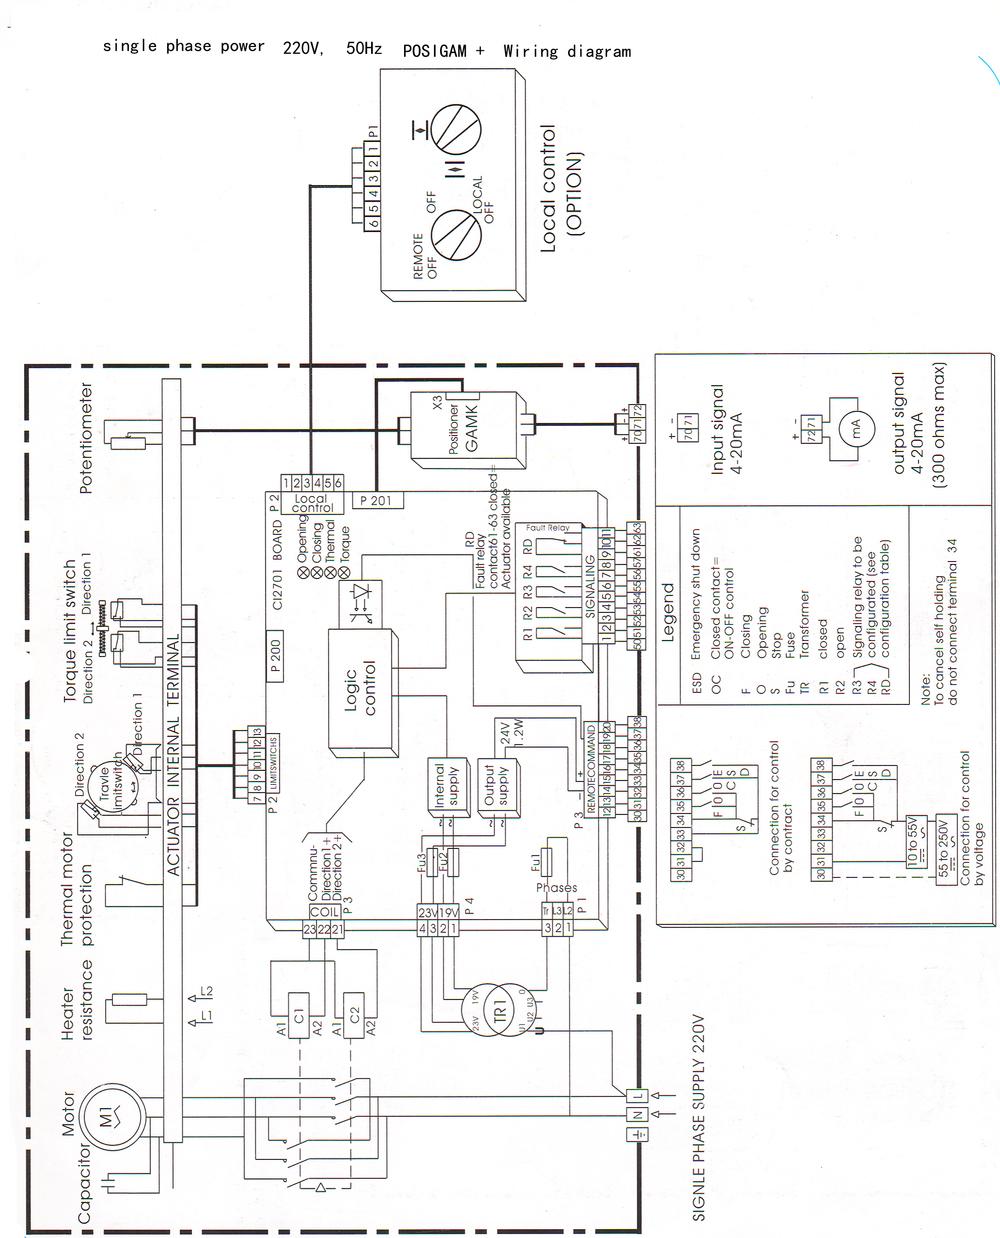 Rotork Iq 20 Wiring Diagram : 27 Wiring Diagram Images